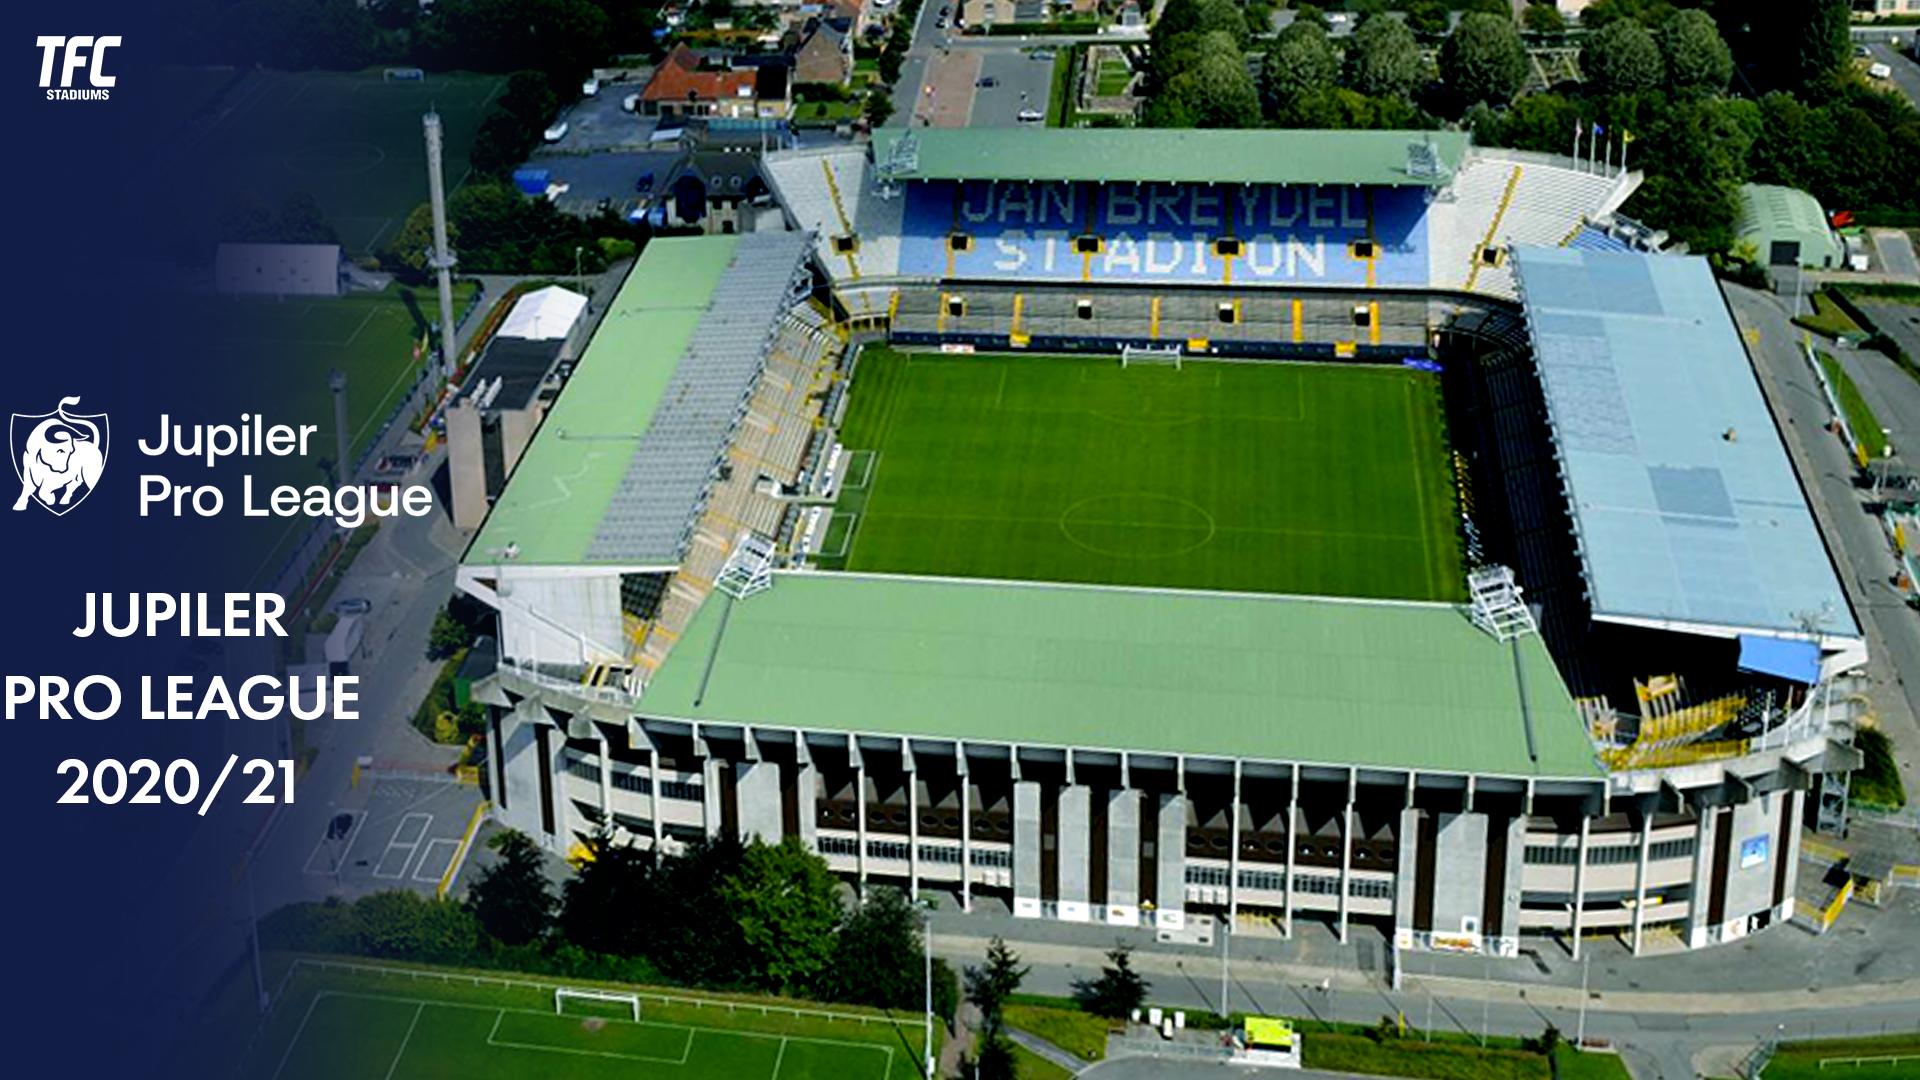 Jupiler Pro League 2020 21 Stadiums Tfc Stadiums